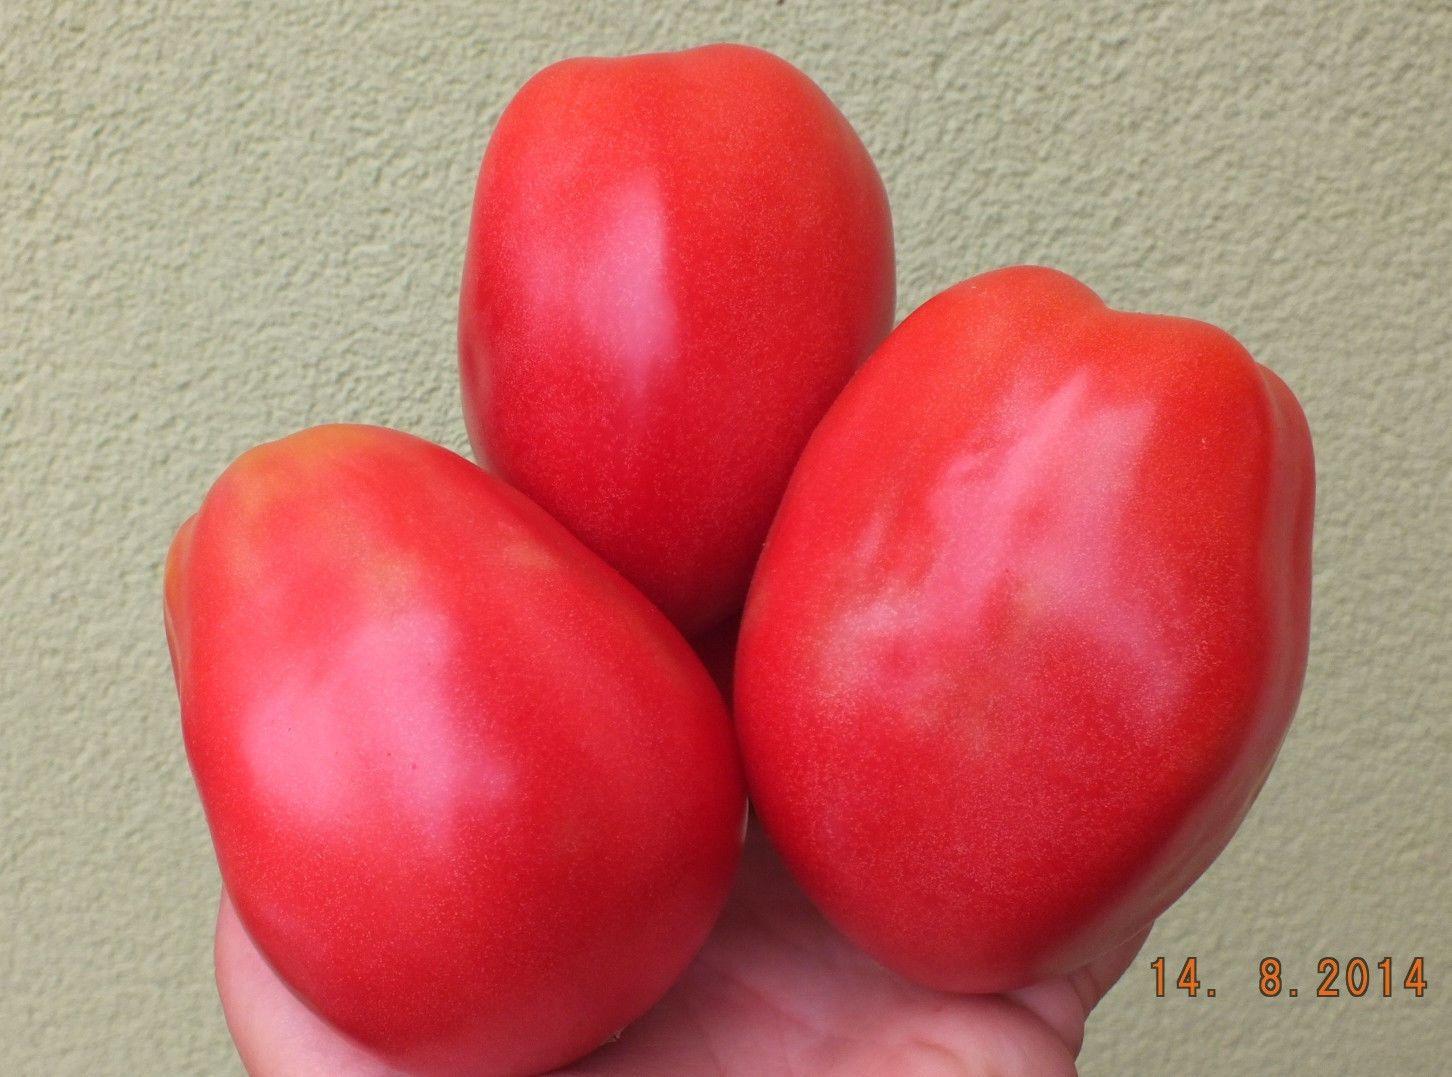 oslinie ushi donkey ears tomato seeds will be available